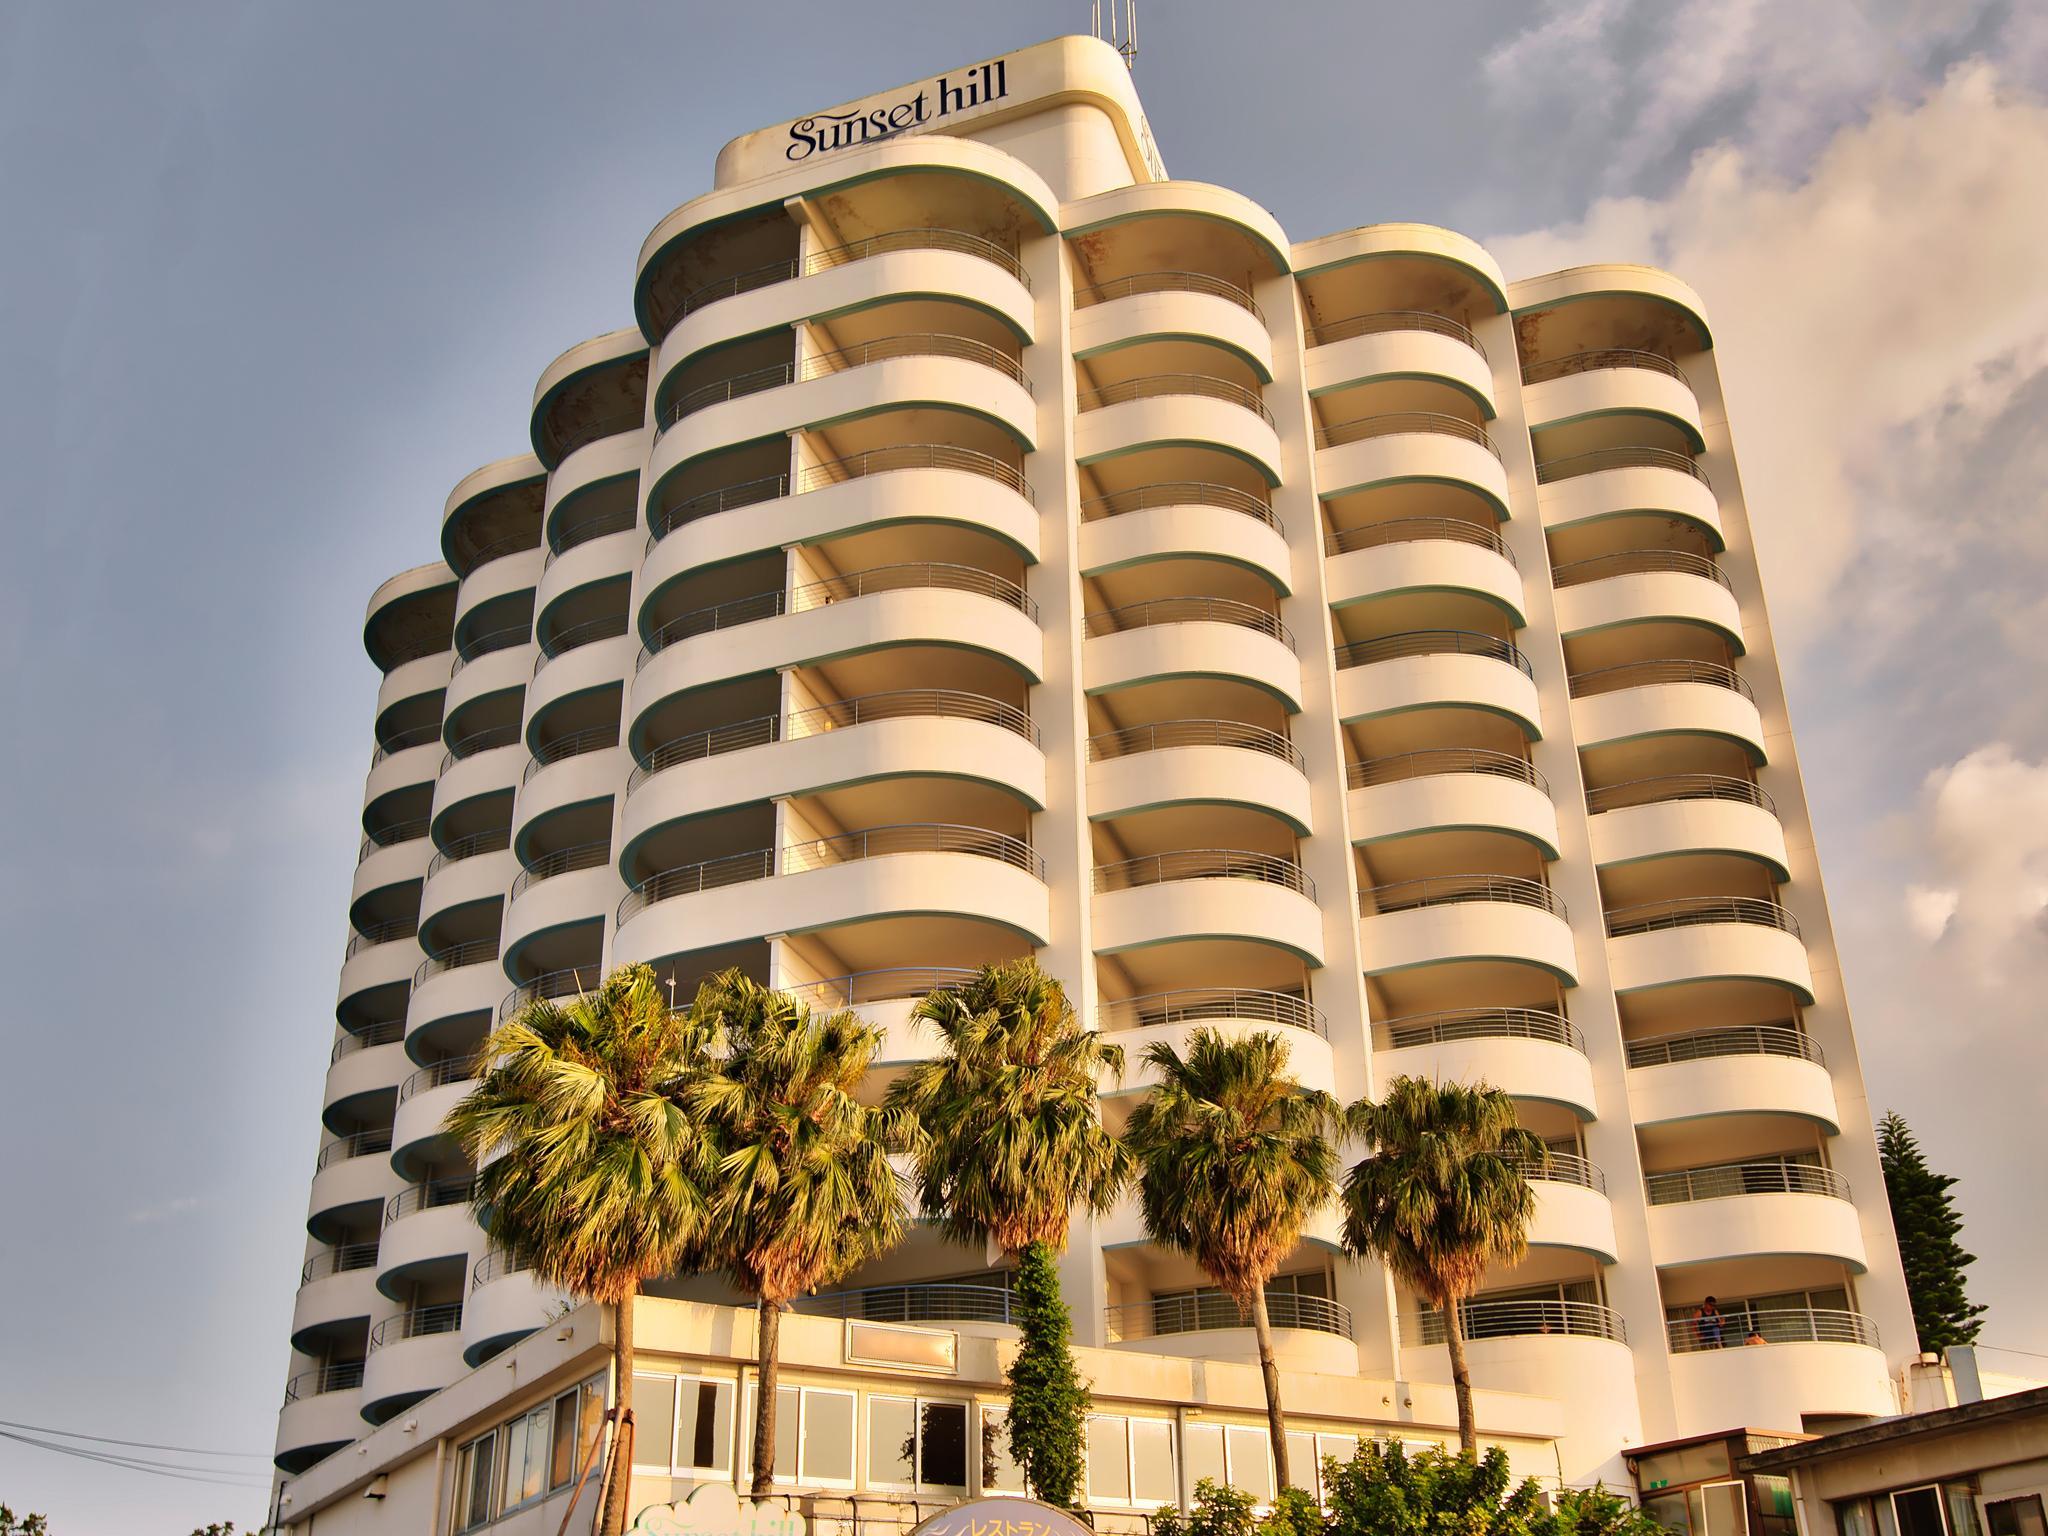 Hotel Sunset Hill, Onna